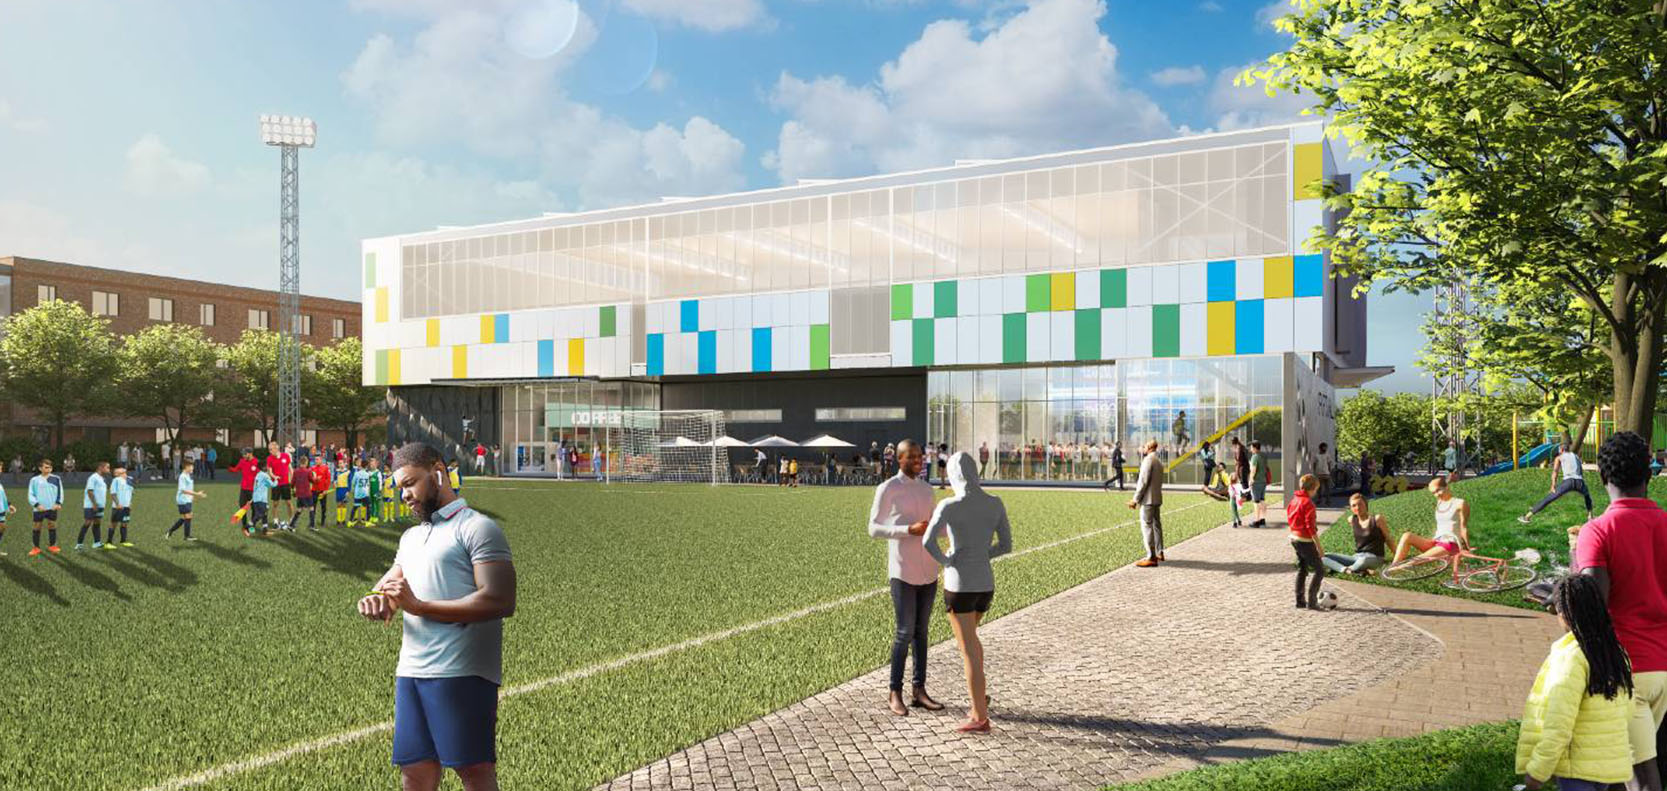 Conradie Park social housing sport fields